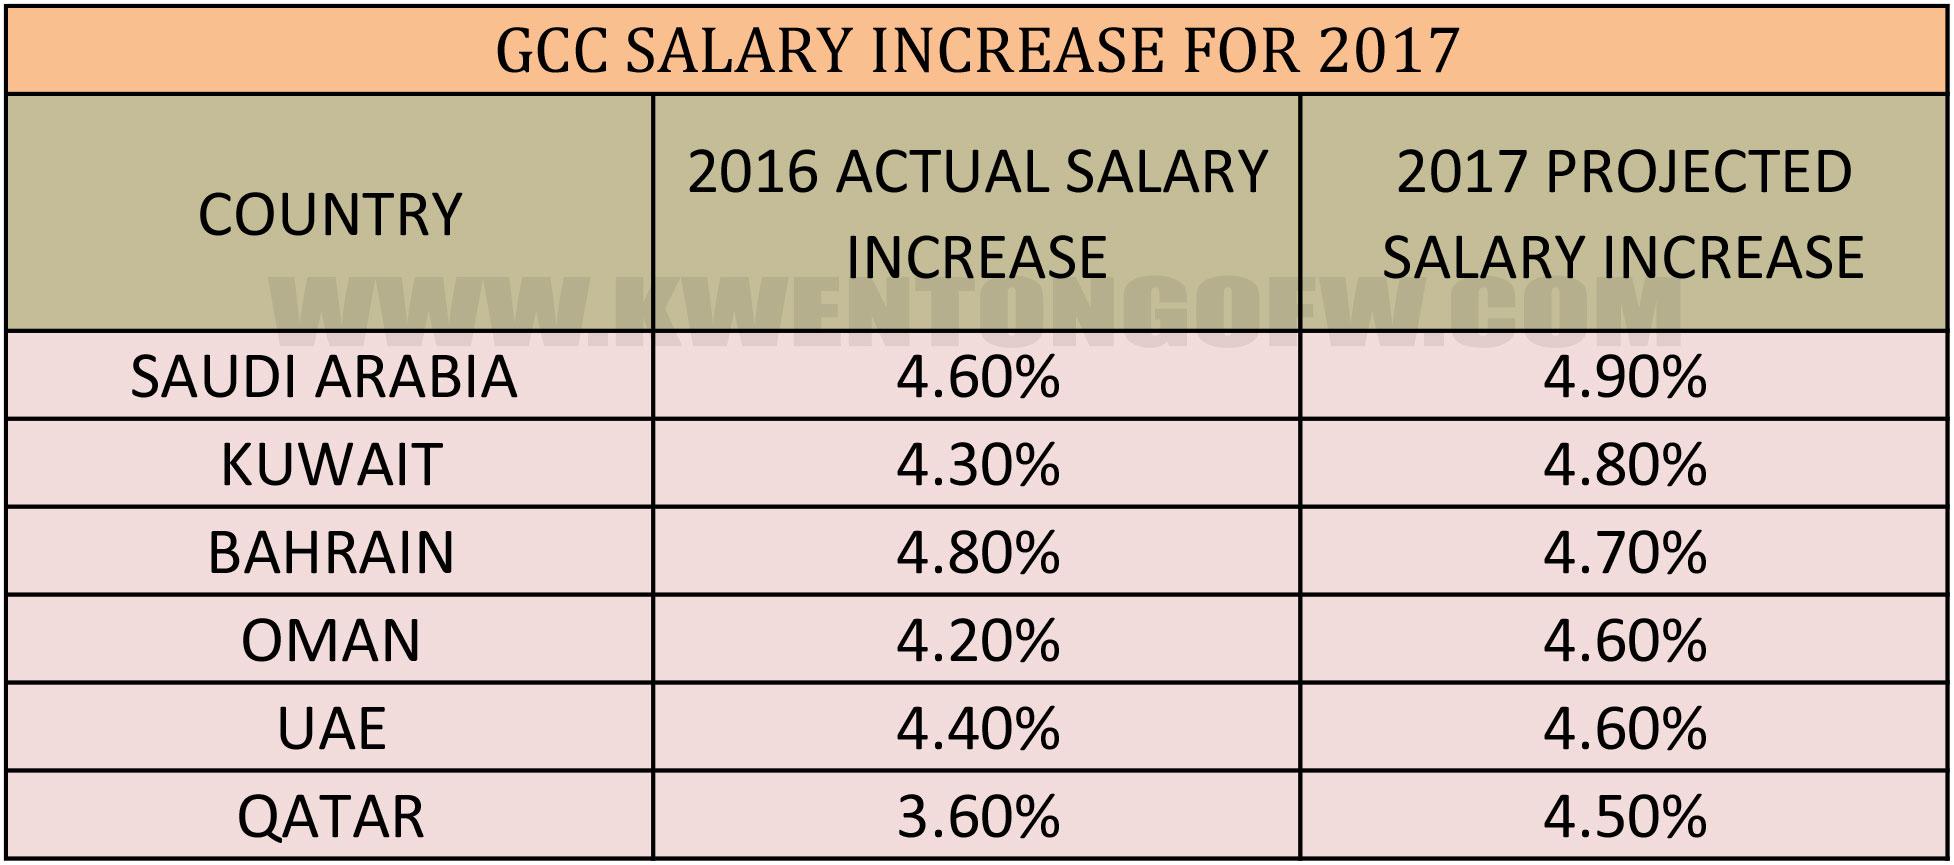 salary-increase-gcc